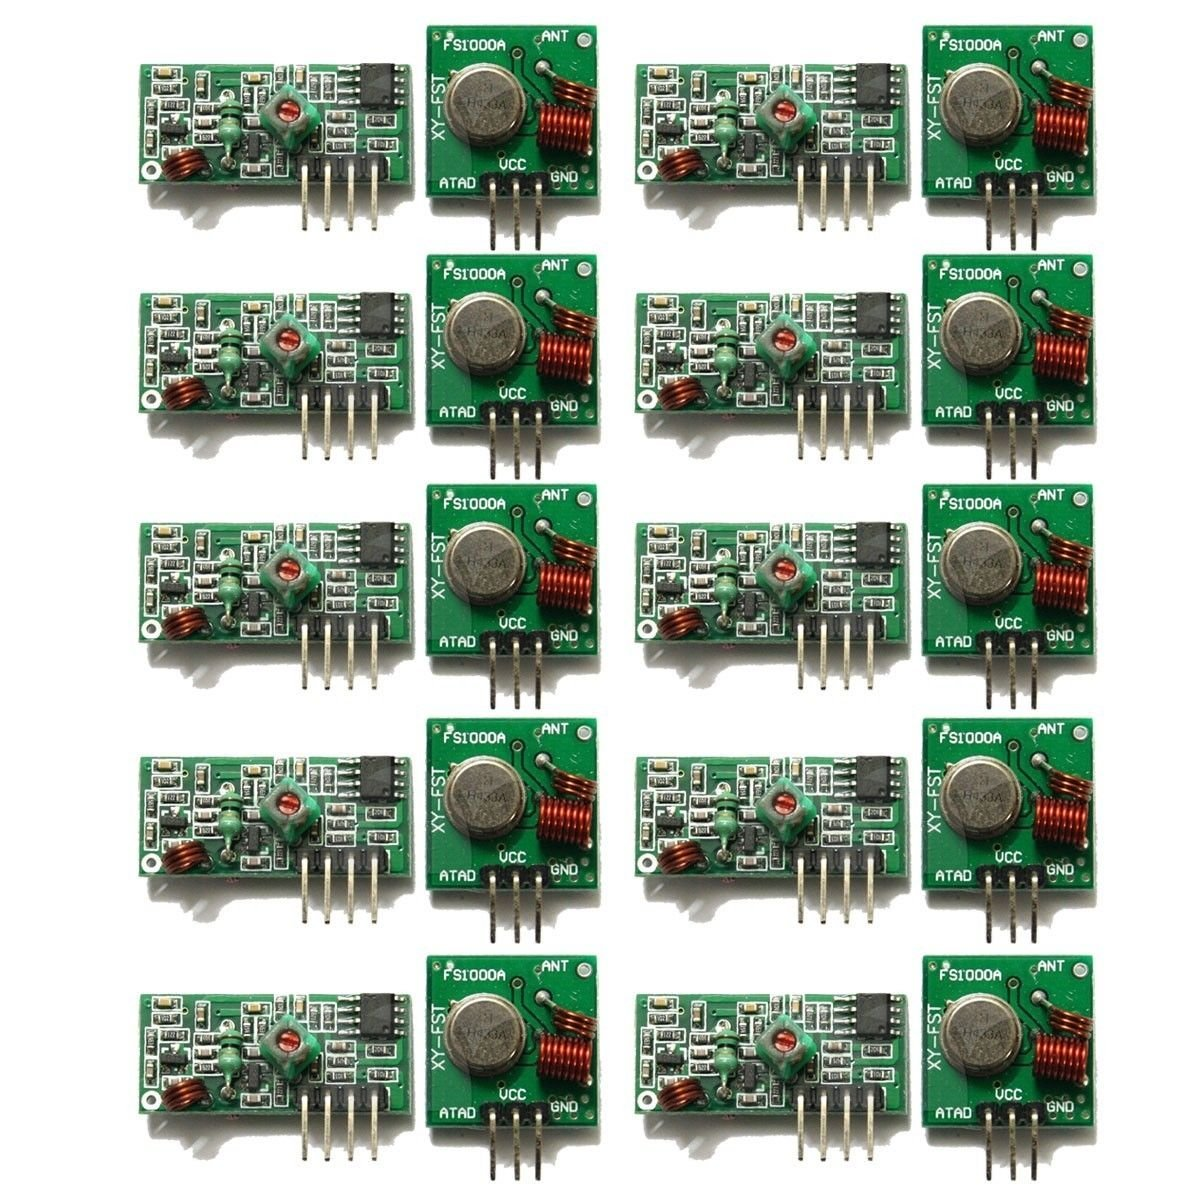 Cheap 315 Mhz Receiver Circuit, find 315 Mhz Receiver